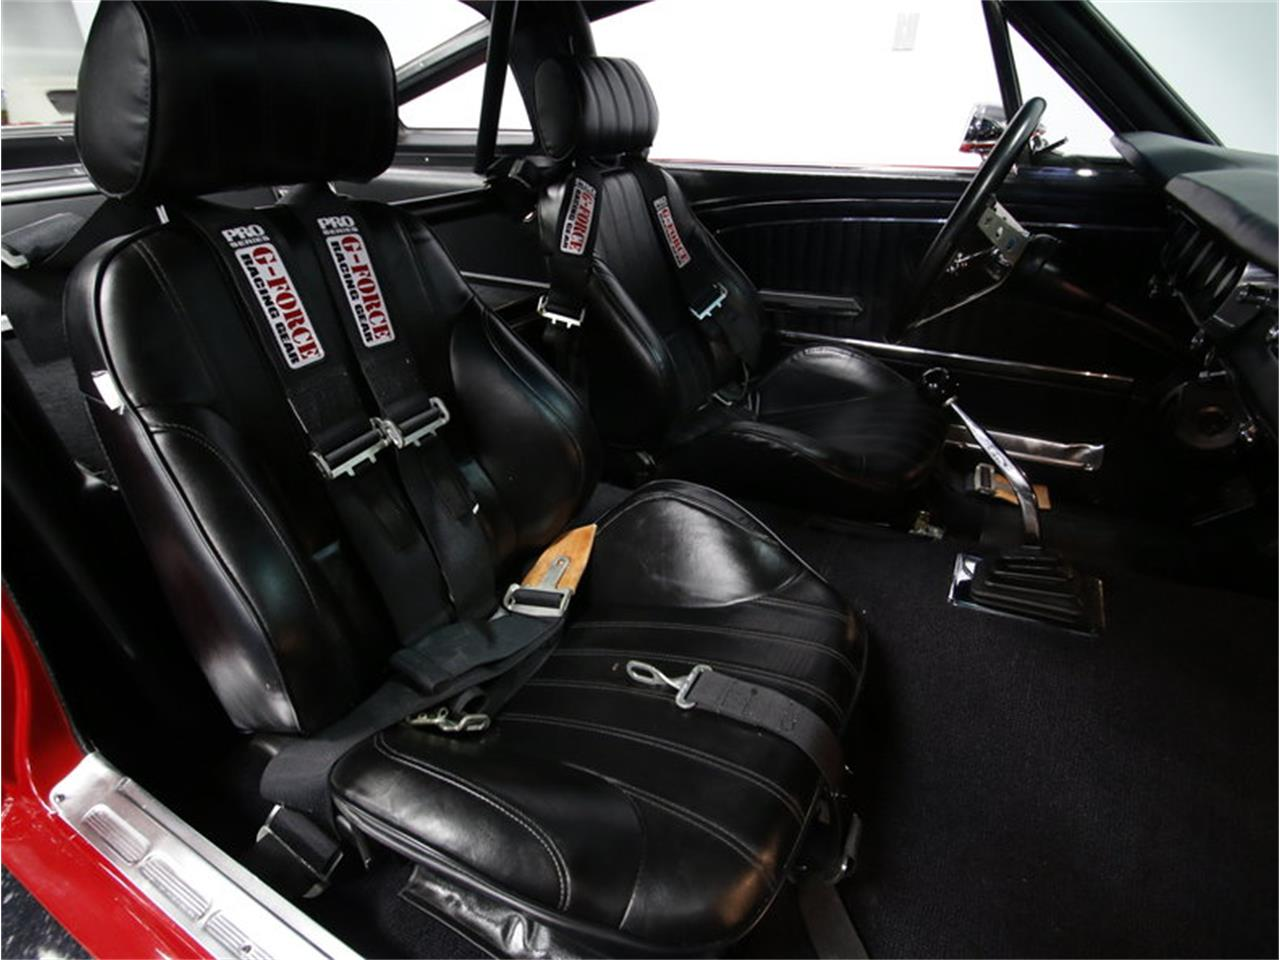 1965 Ford Mustang Fastback Restomod in Concord, North Carolina